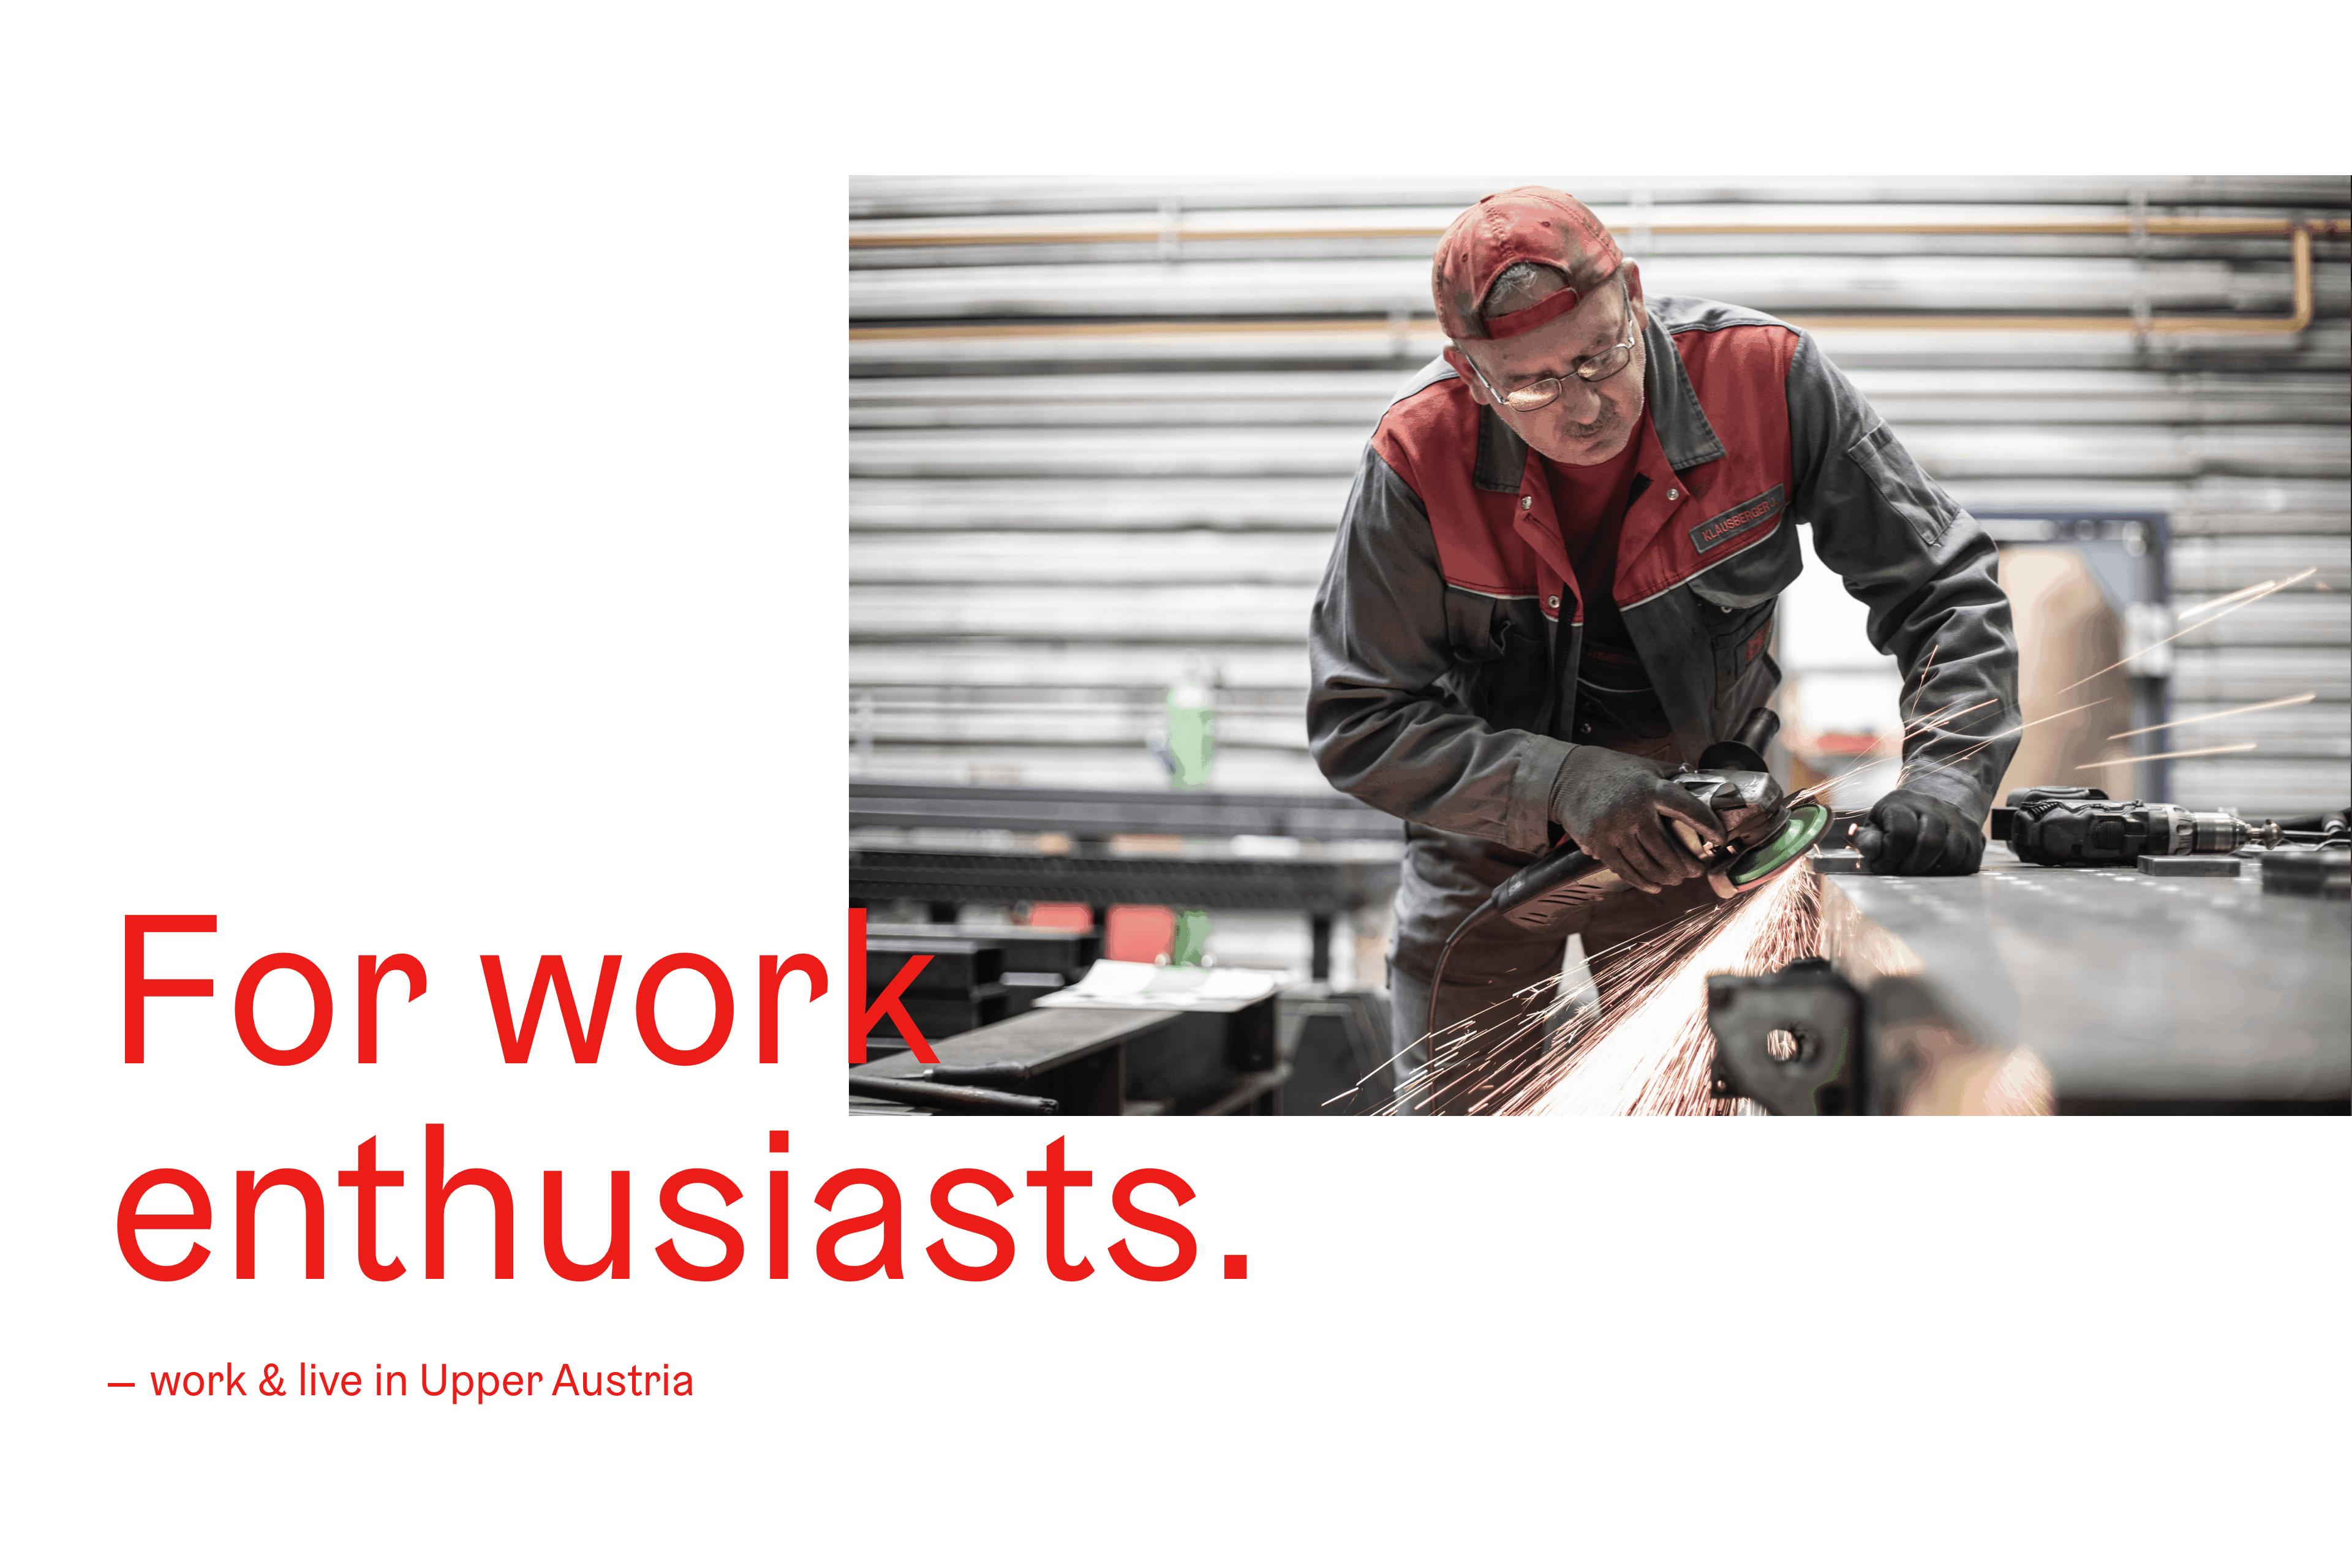 Ref upperaustria work enthusiasts 2x